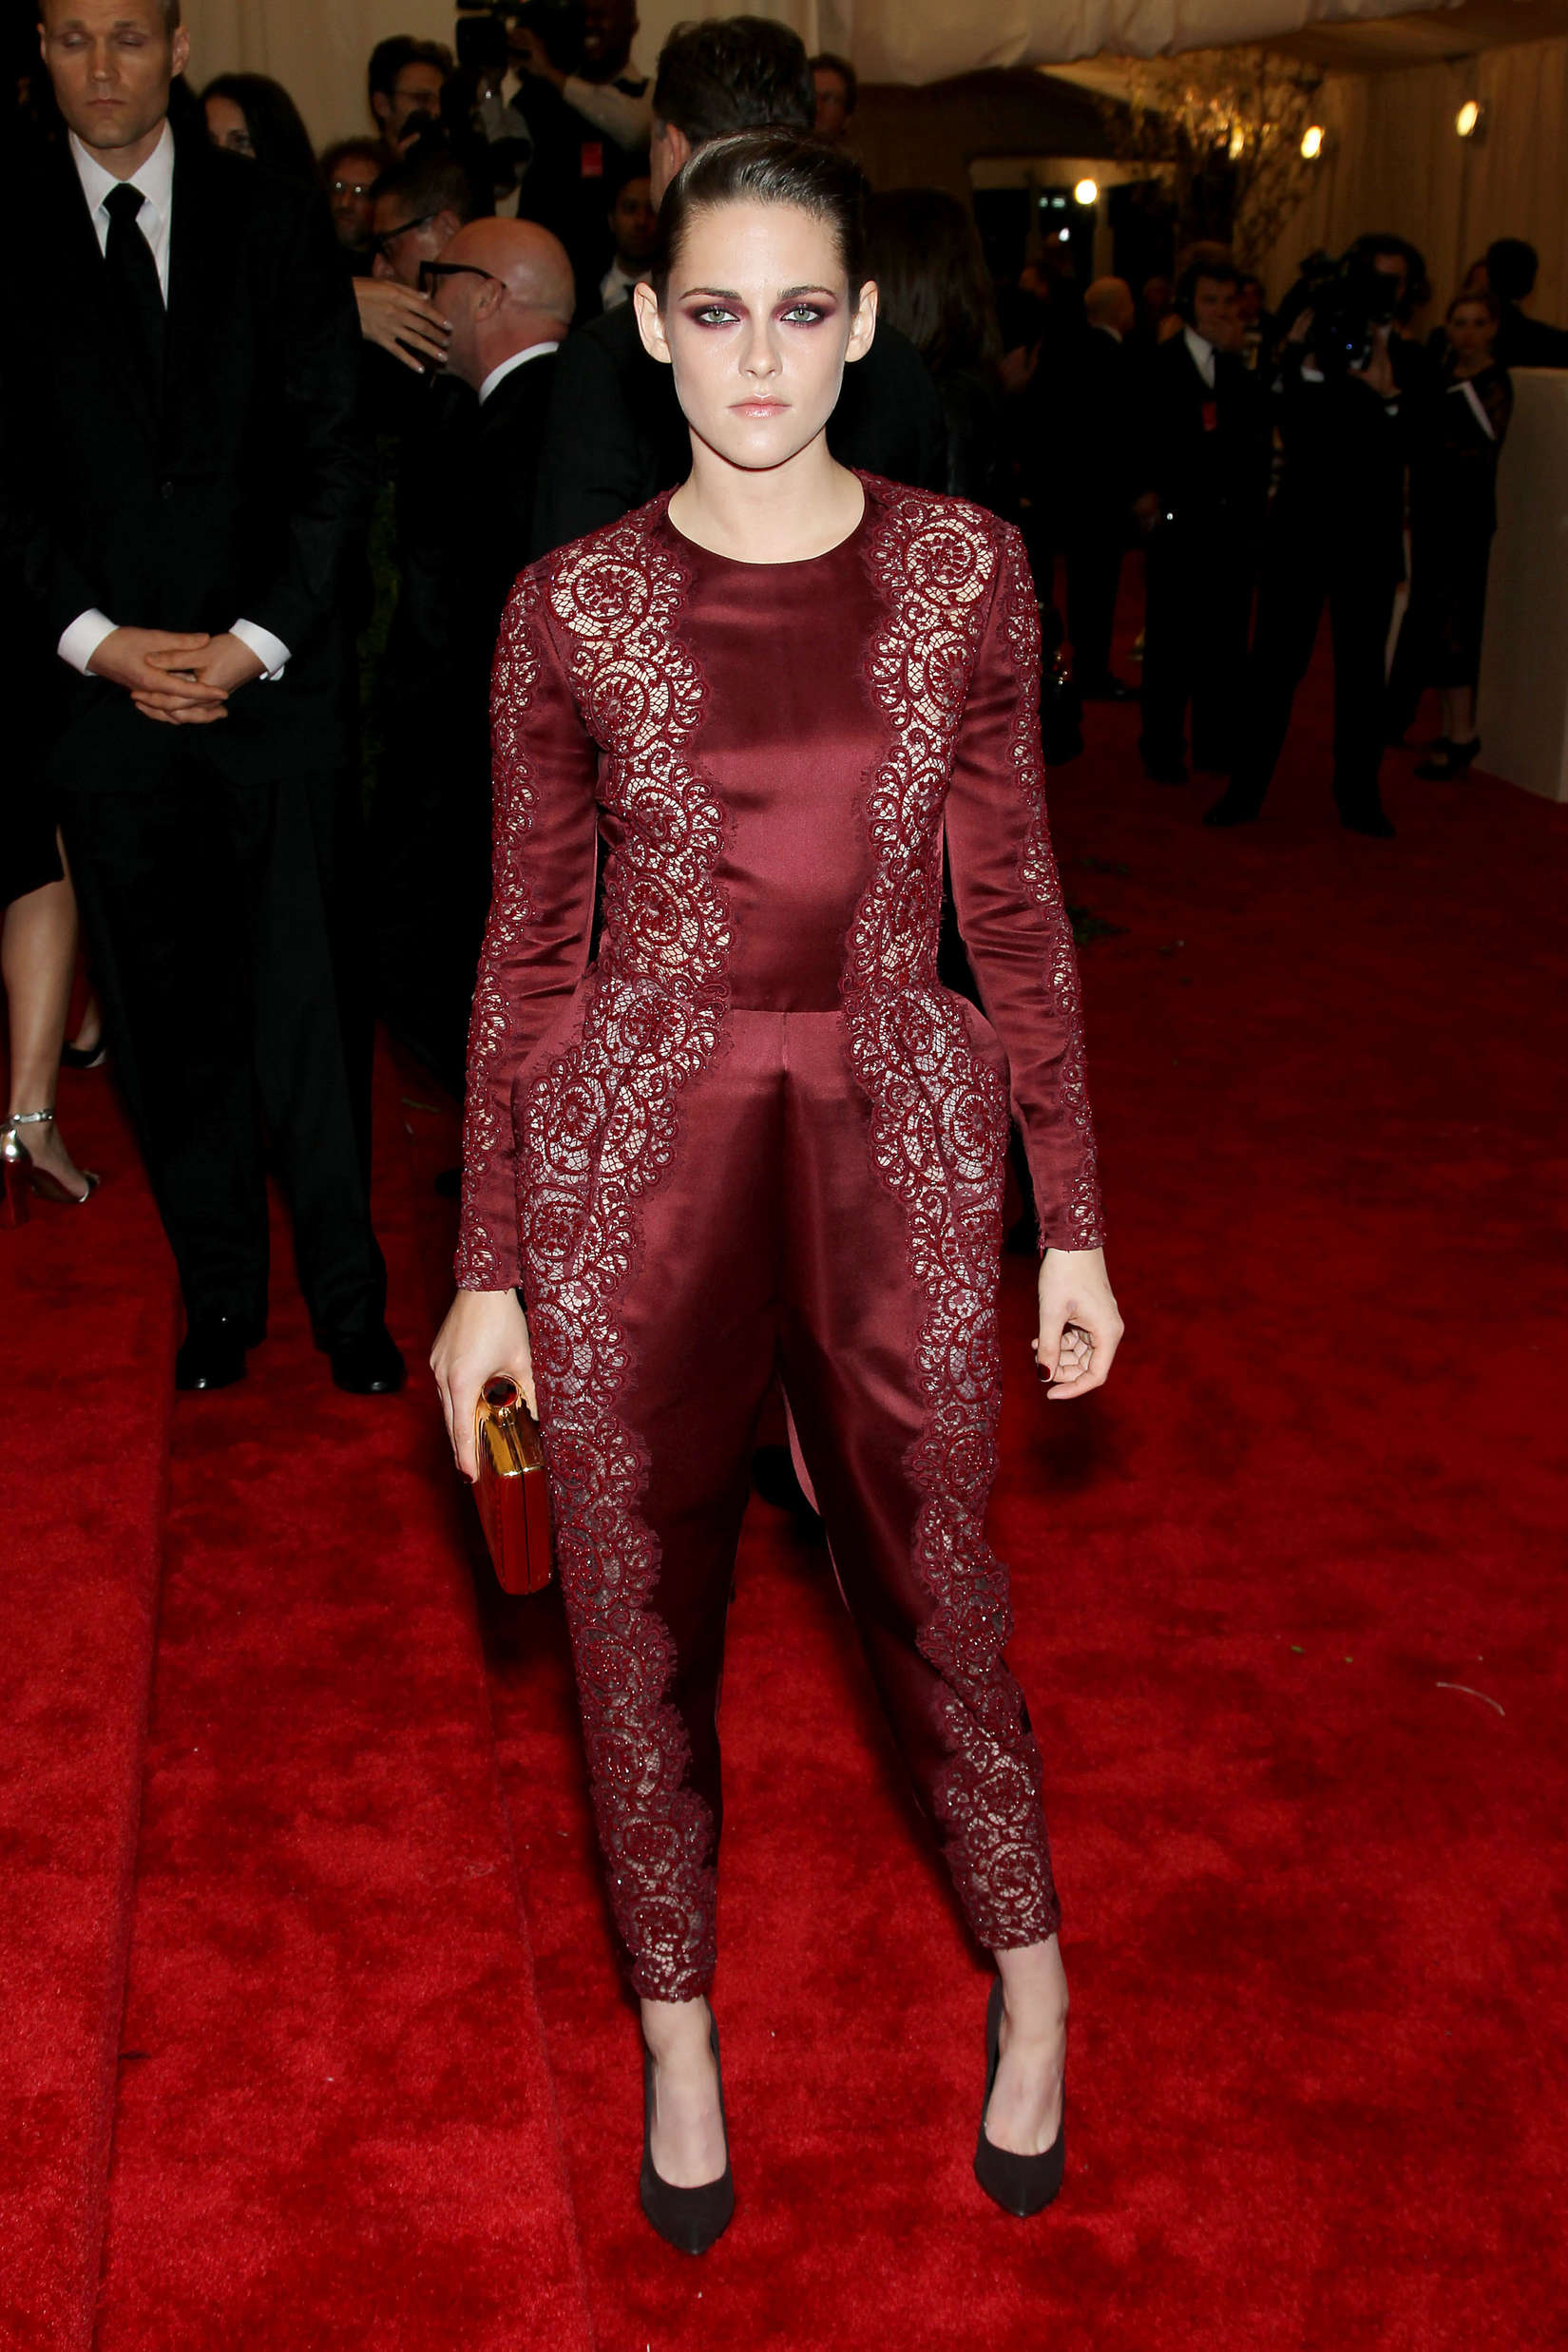 Kristen Stewart 2013 Met Gala At The Metropolitan Museum